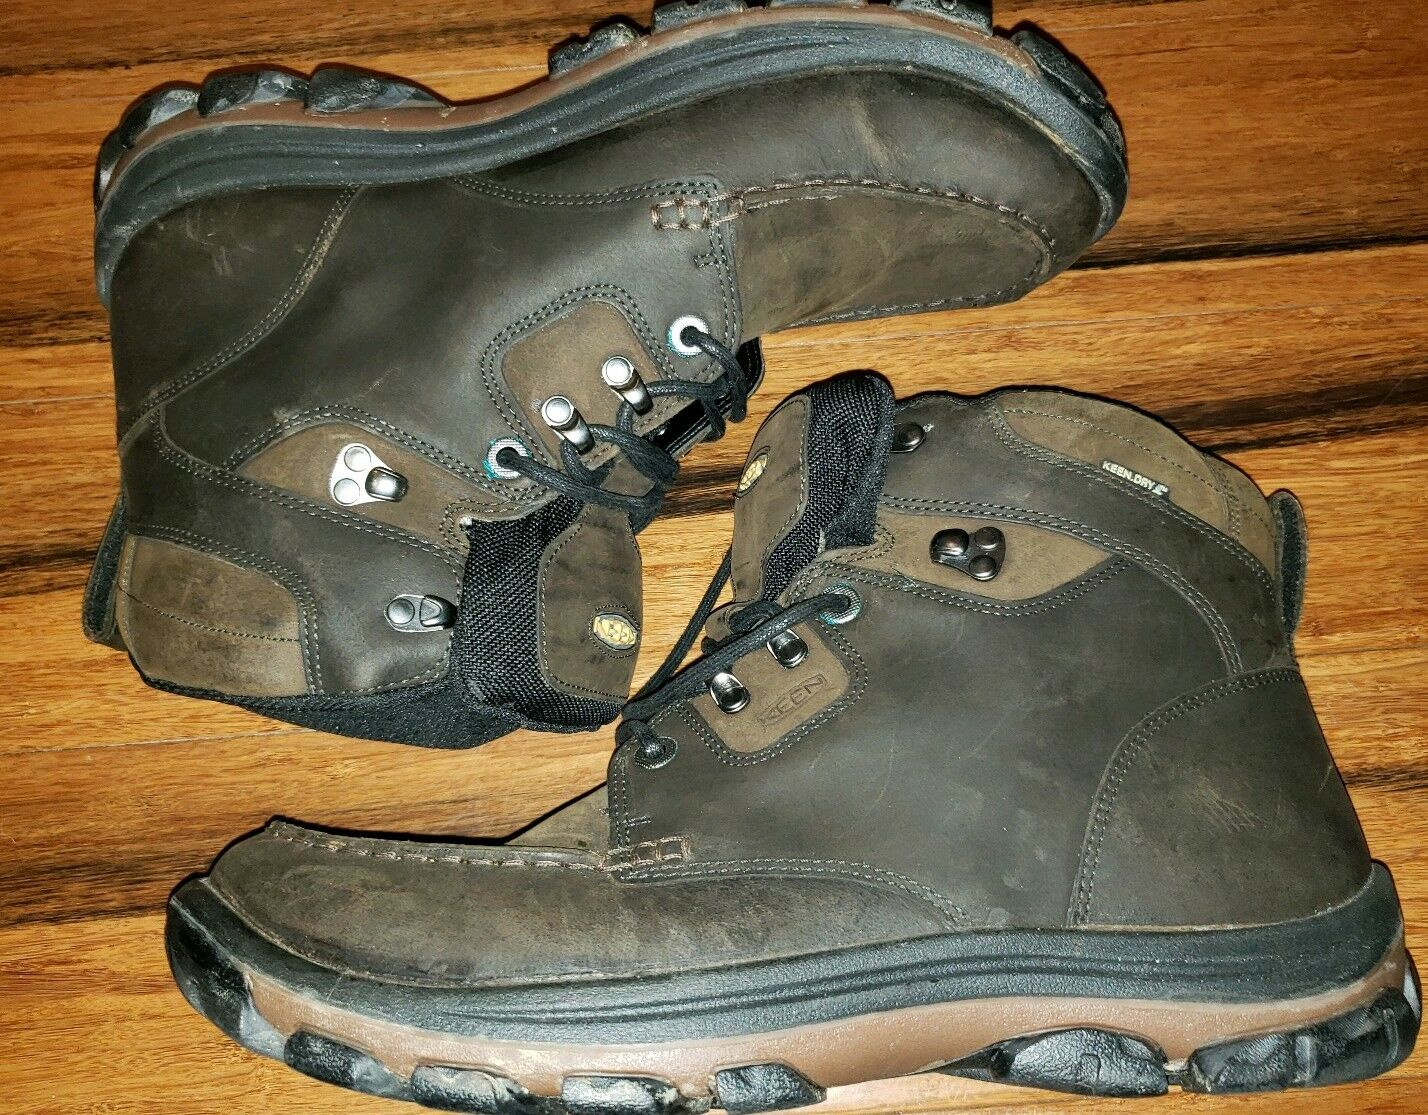 Keen Uomo Nopo Waterproof Hiking avvio avvio avvio Keen Dry Uomo Sz 12 Marrone  170 0ee44e